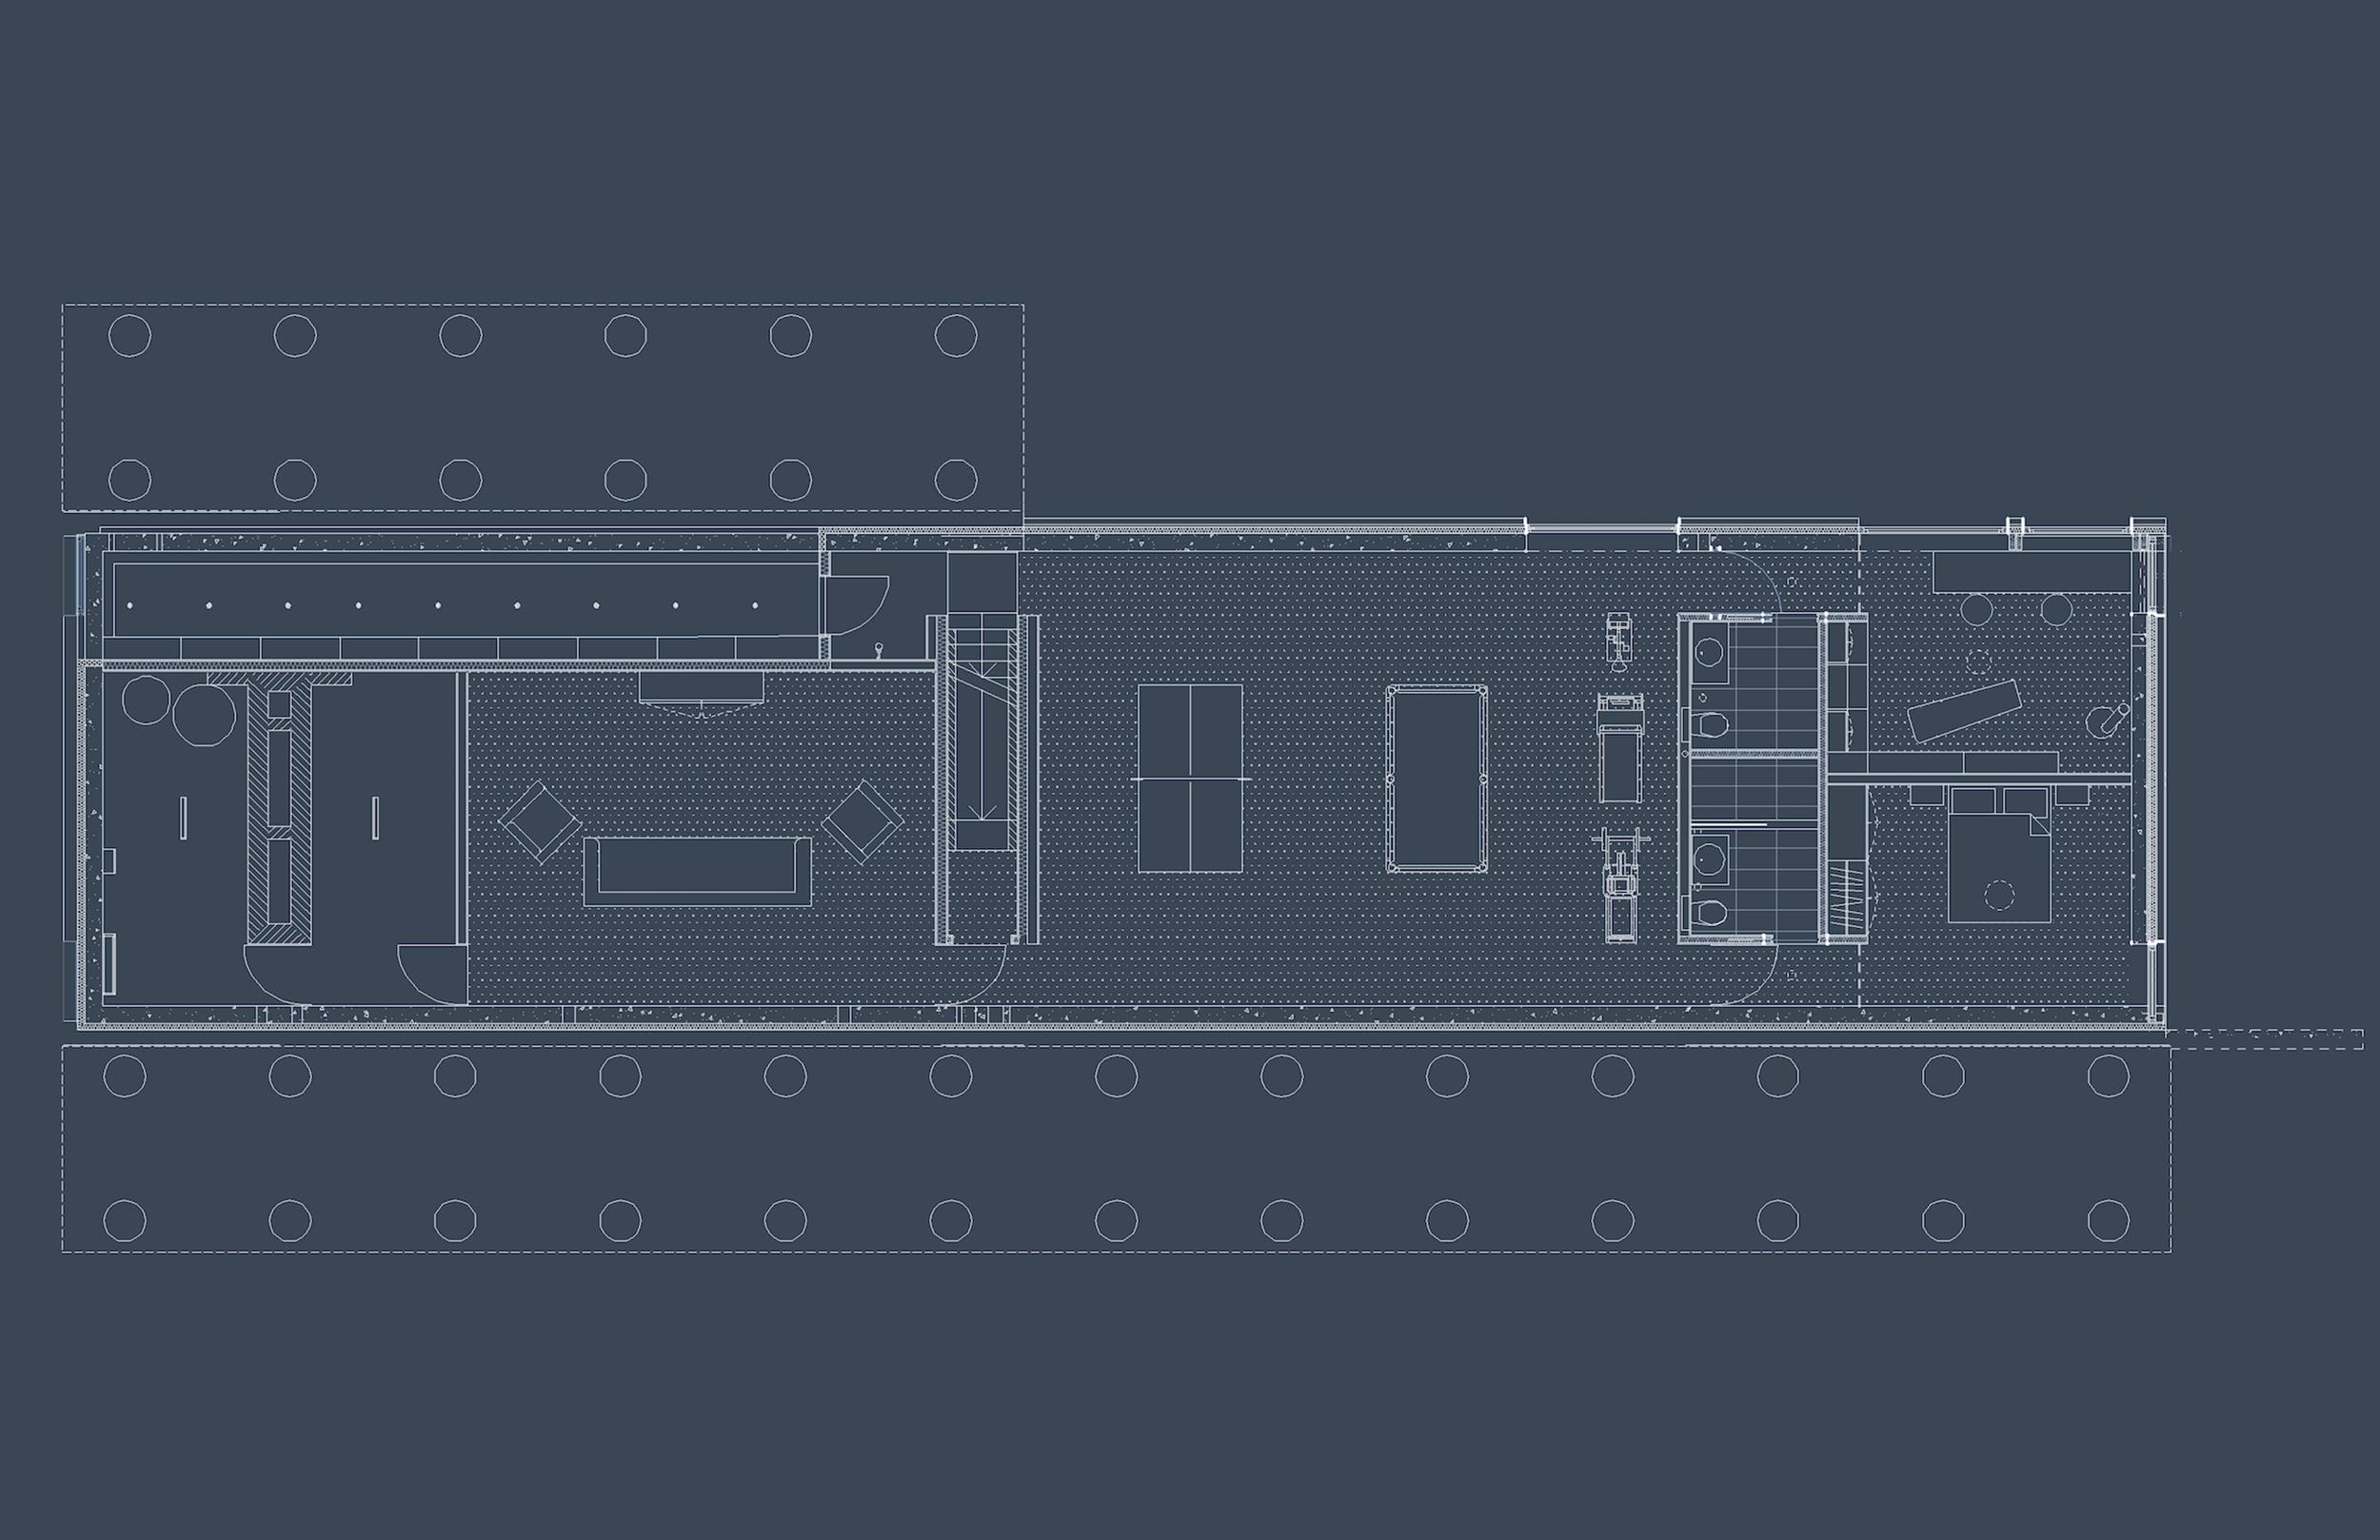 Mountain House - Basement Floor Plan